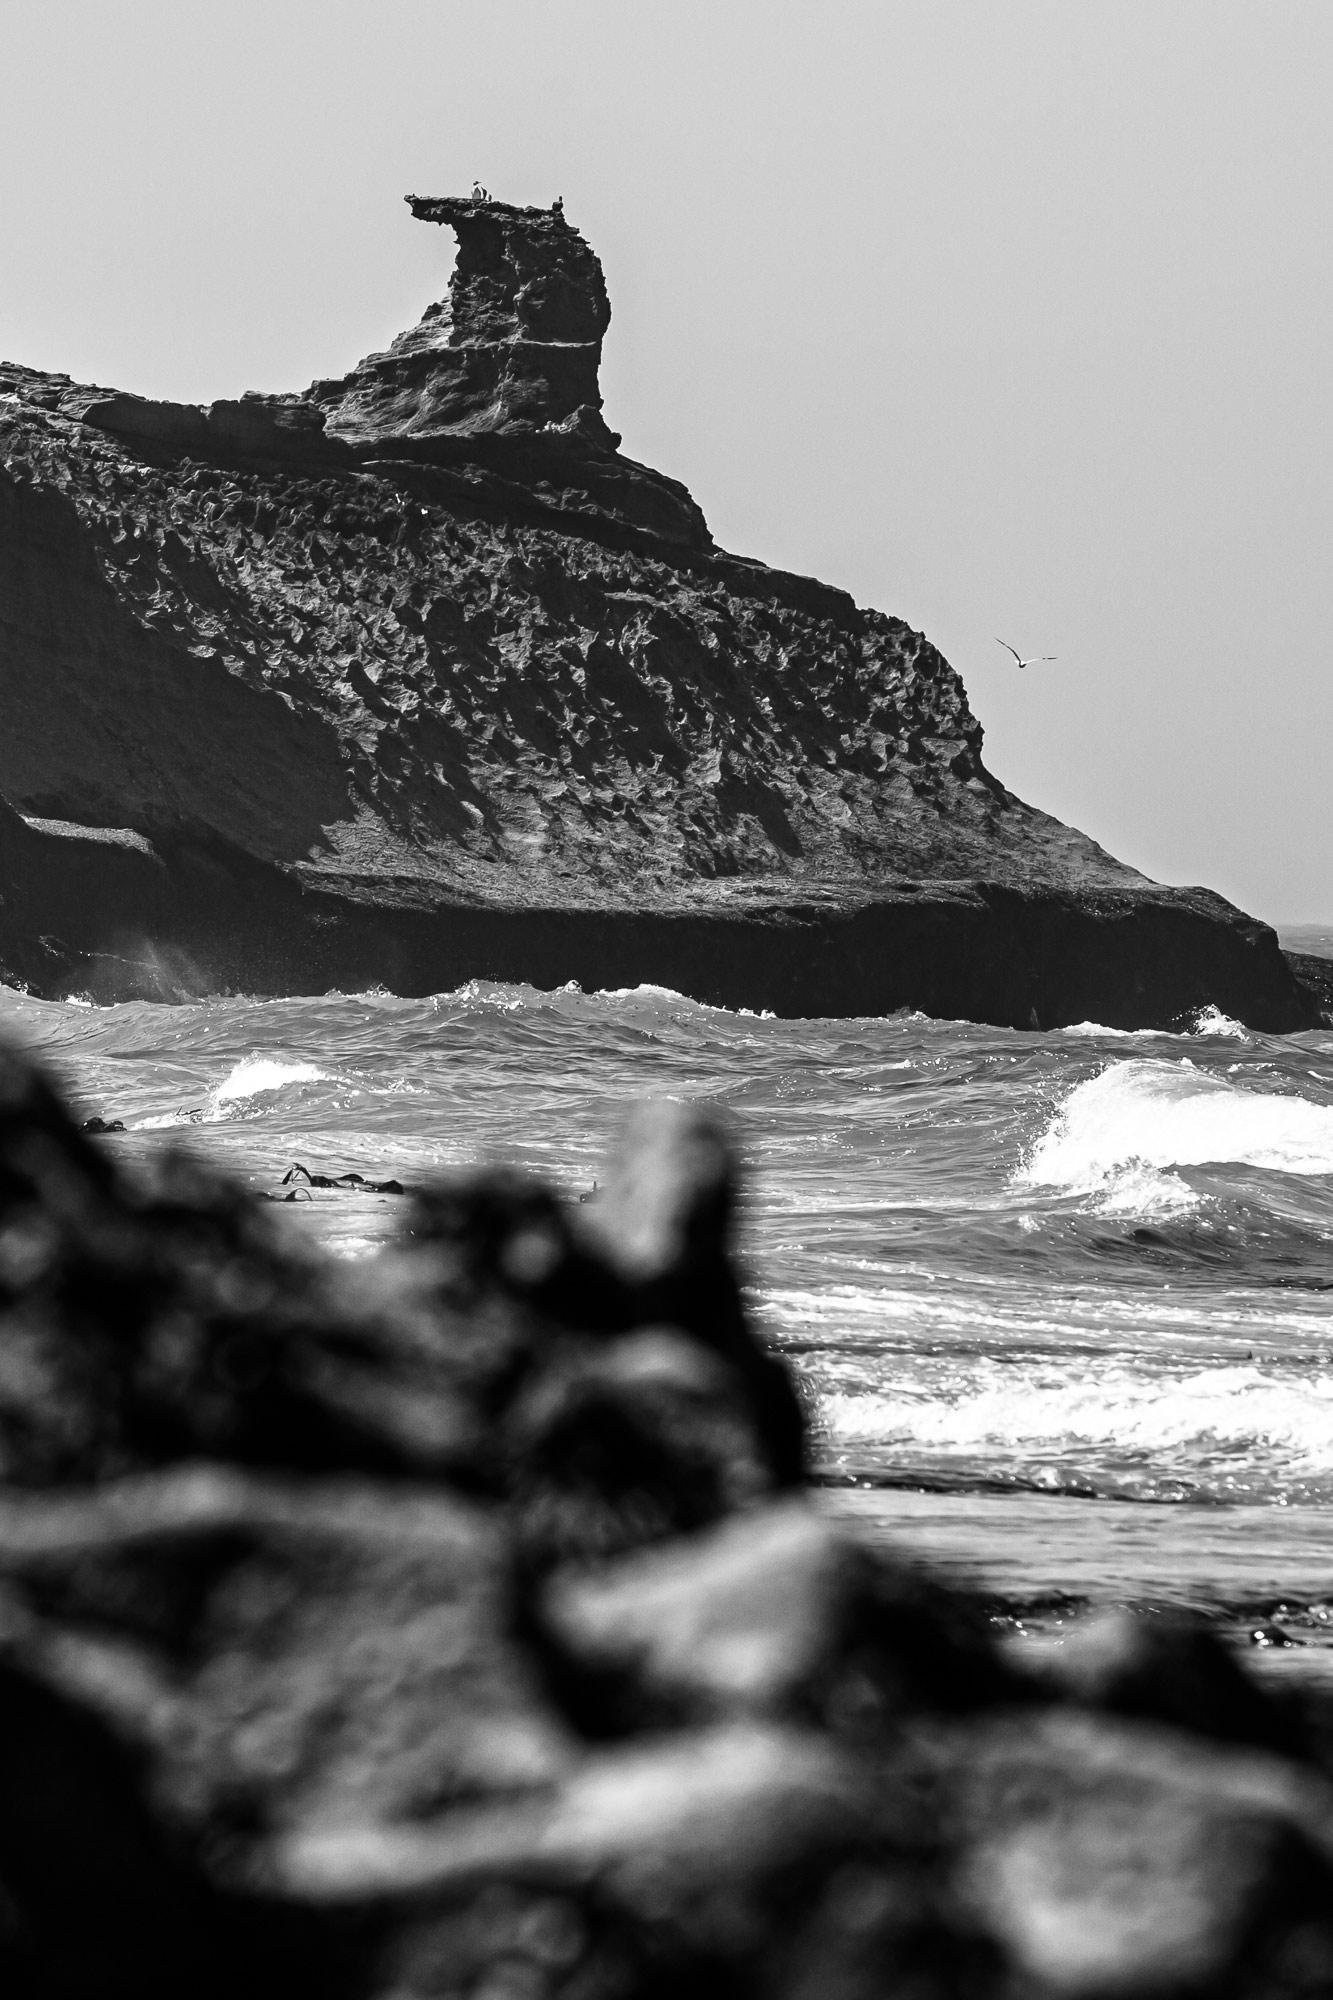 Trek au Maroc Agadir Essaouira océan